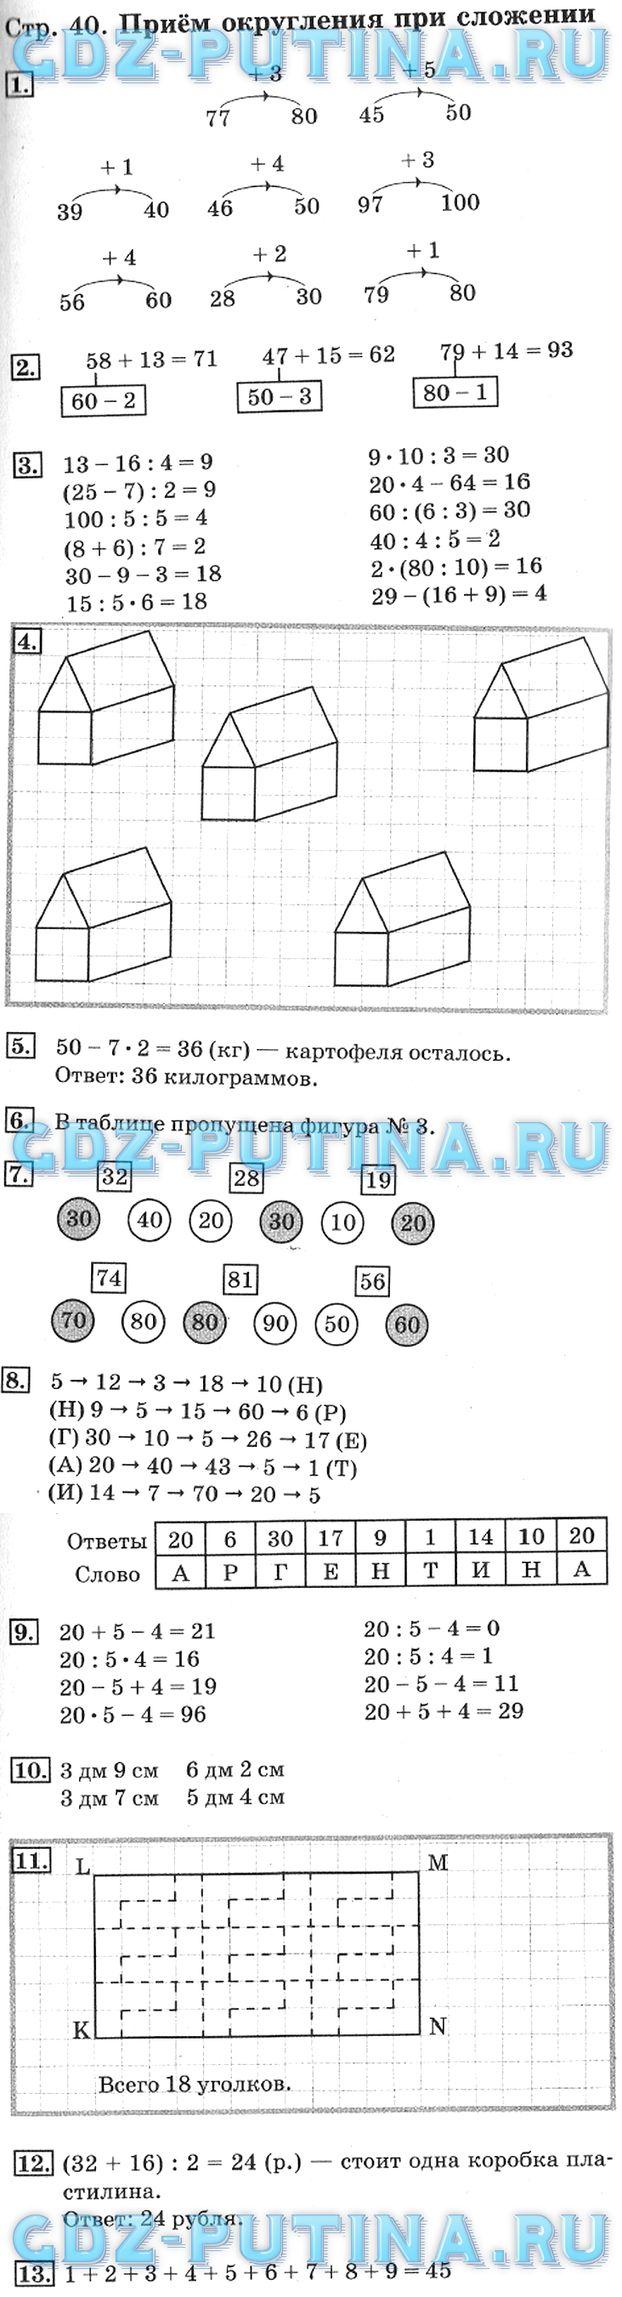 Гдз математика 4 класс перспектива 2 часть